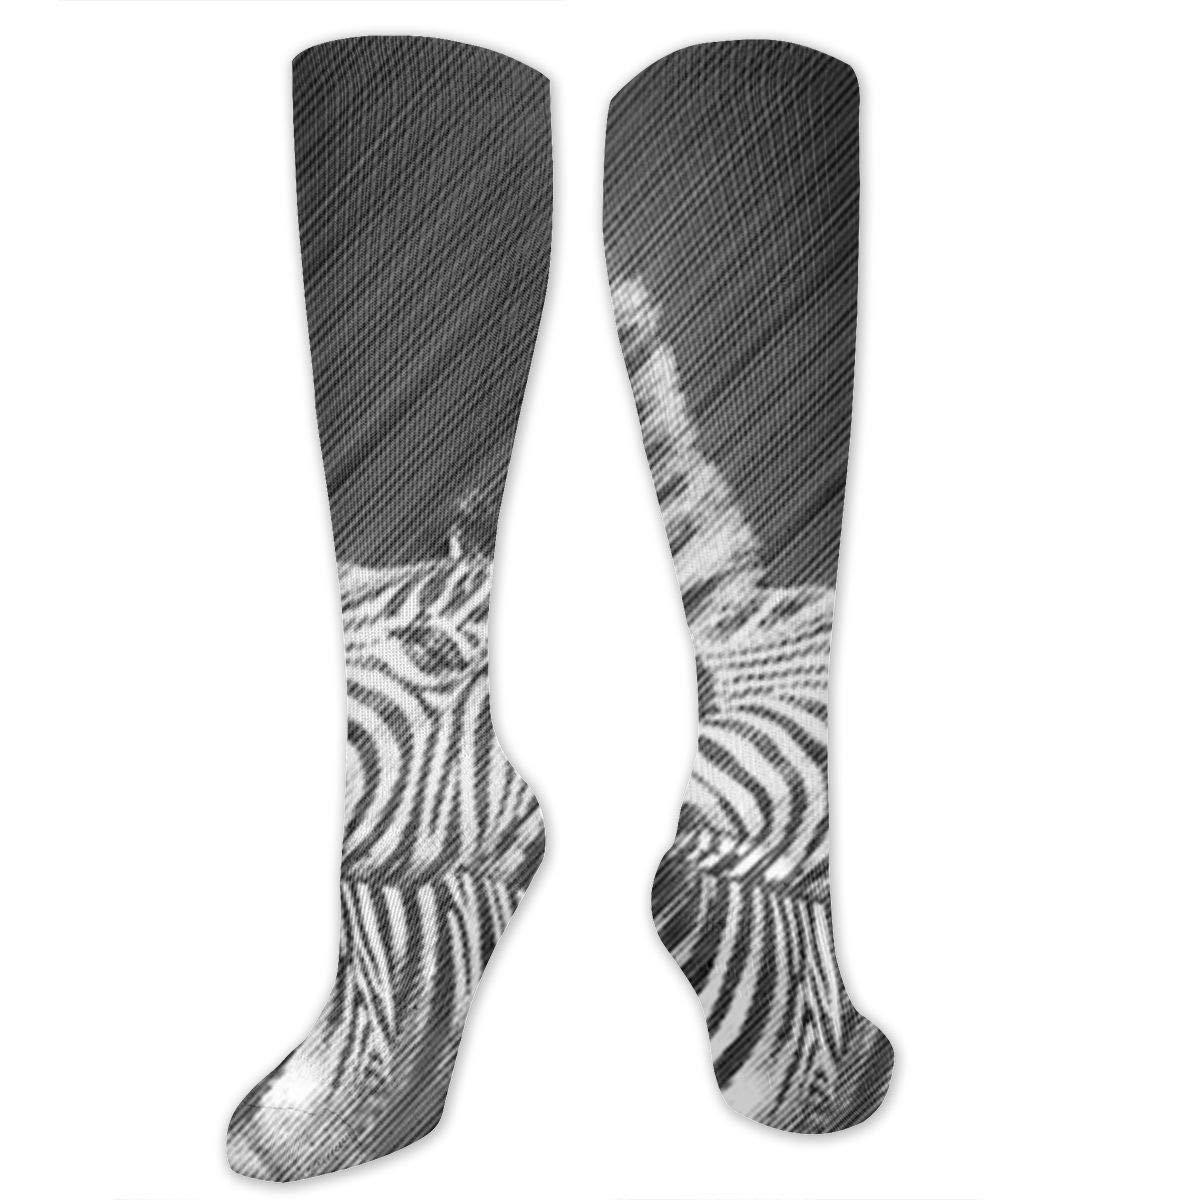 Chanwazibibiliu Zebra Mens Colorful Dress Socks Funky Men Multicolored Pattern Fashionable Fun Crew Cotton Socks